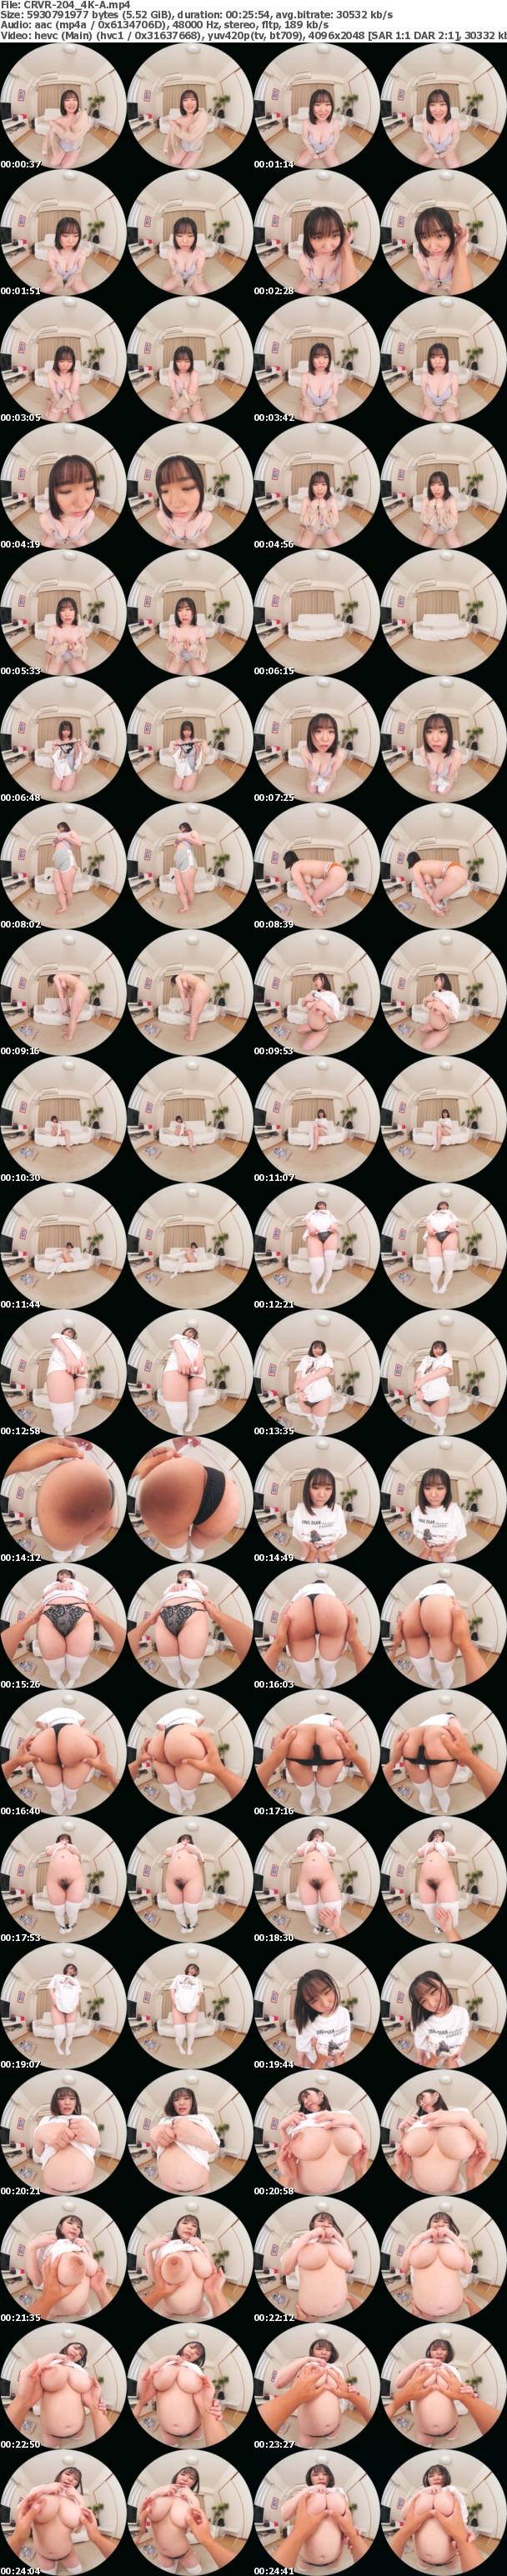 (VR) (4K) CRVR-204 露梨あやせ 極上爆乳×白目絶頂VR 巨乳がすごい!お尻がすごい!そして何より白目がすごい!国宝級爆乳女優の白目むき出し絶叫セックス!